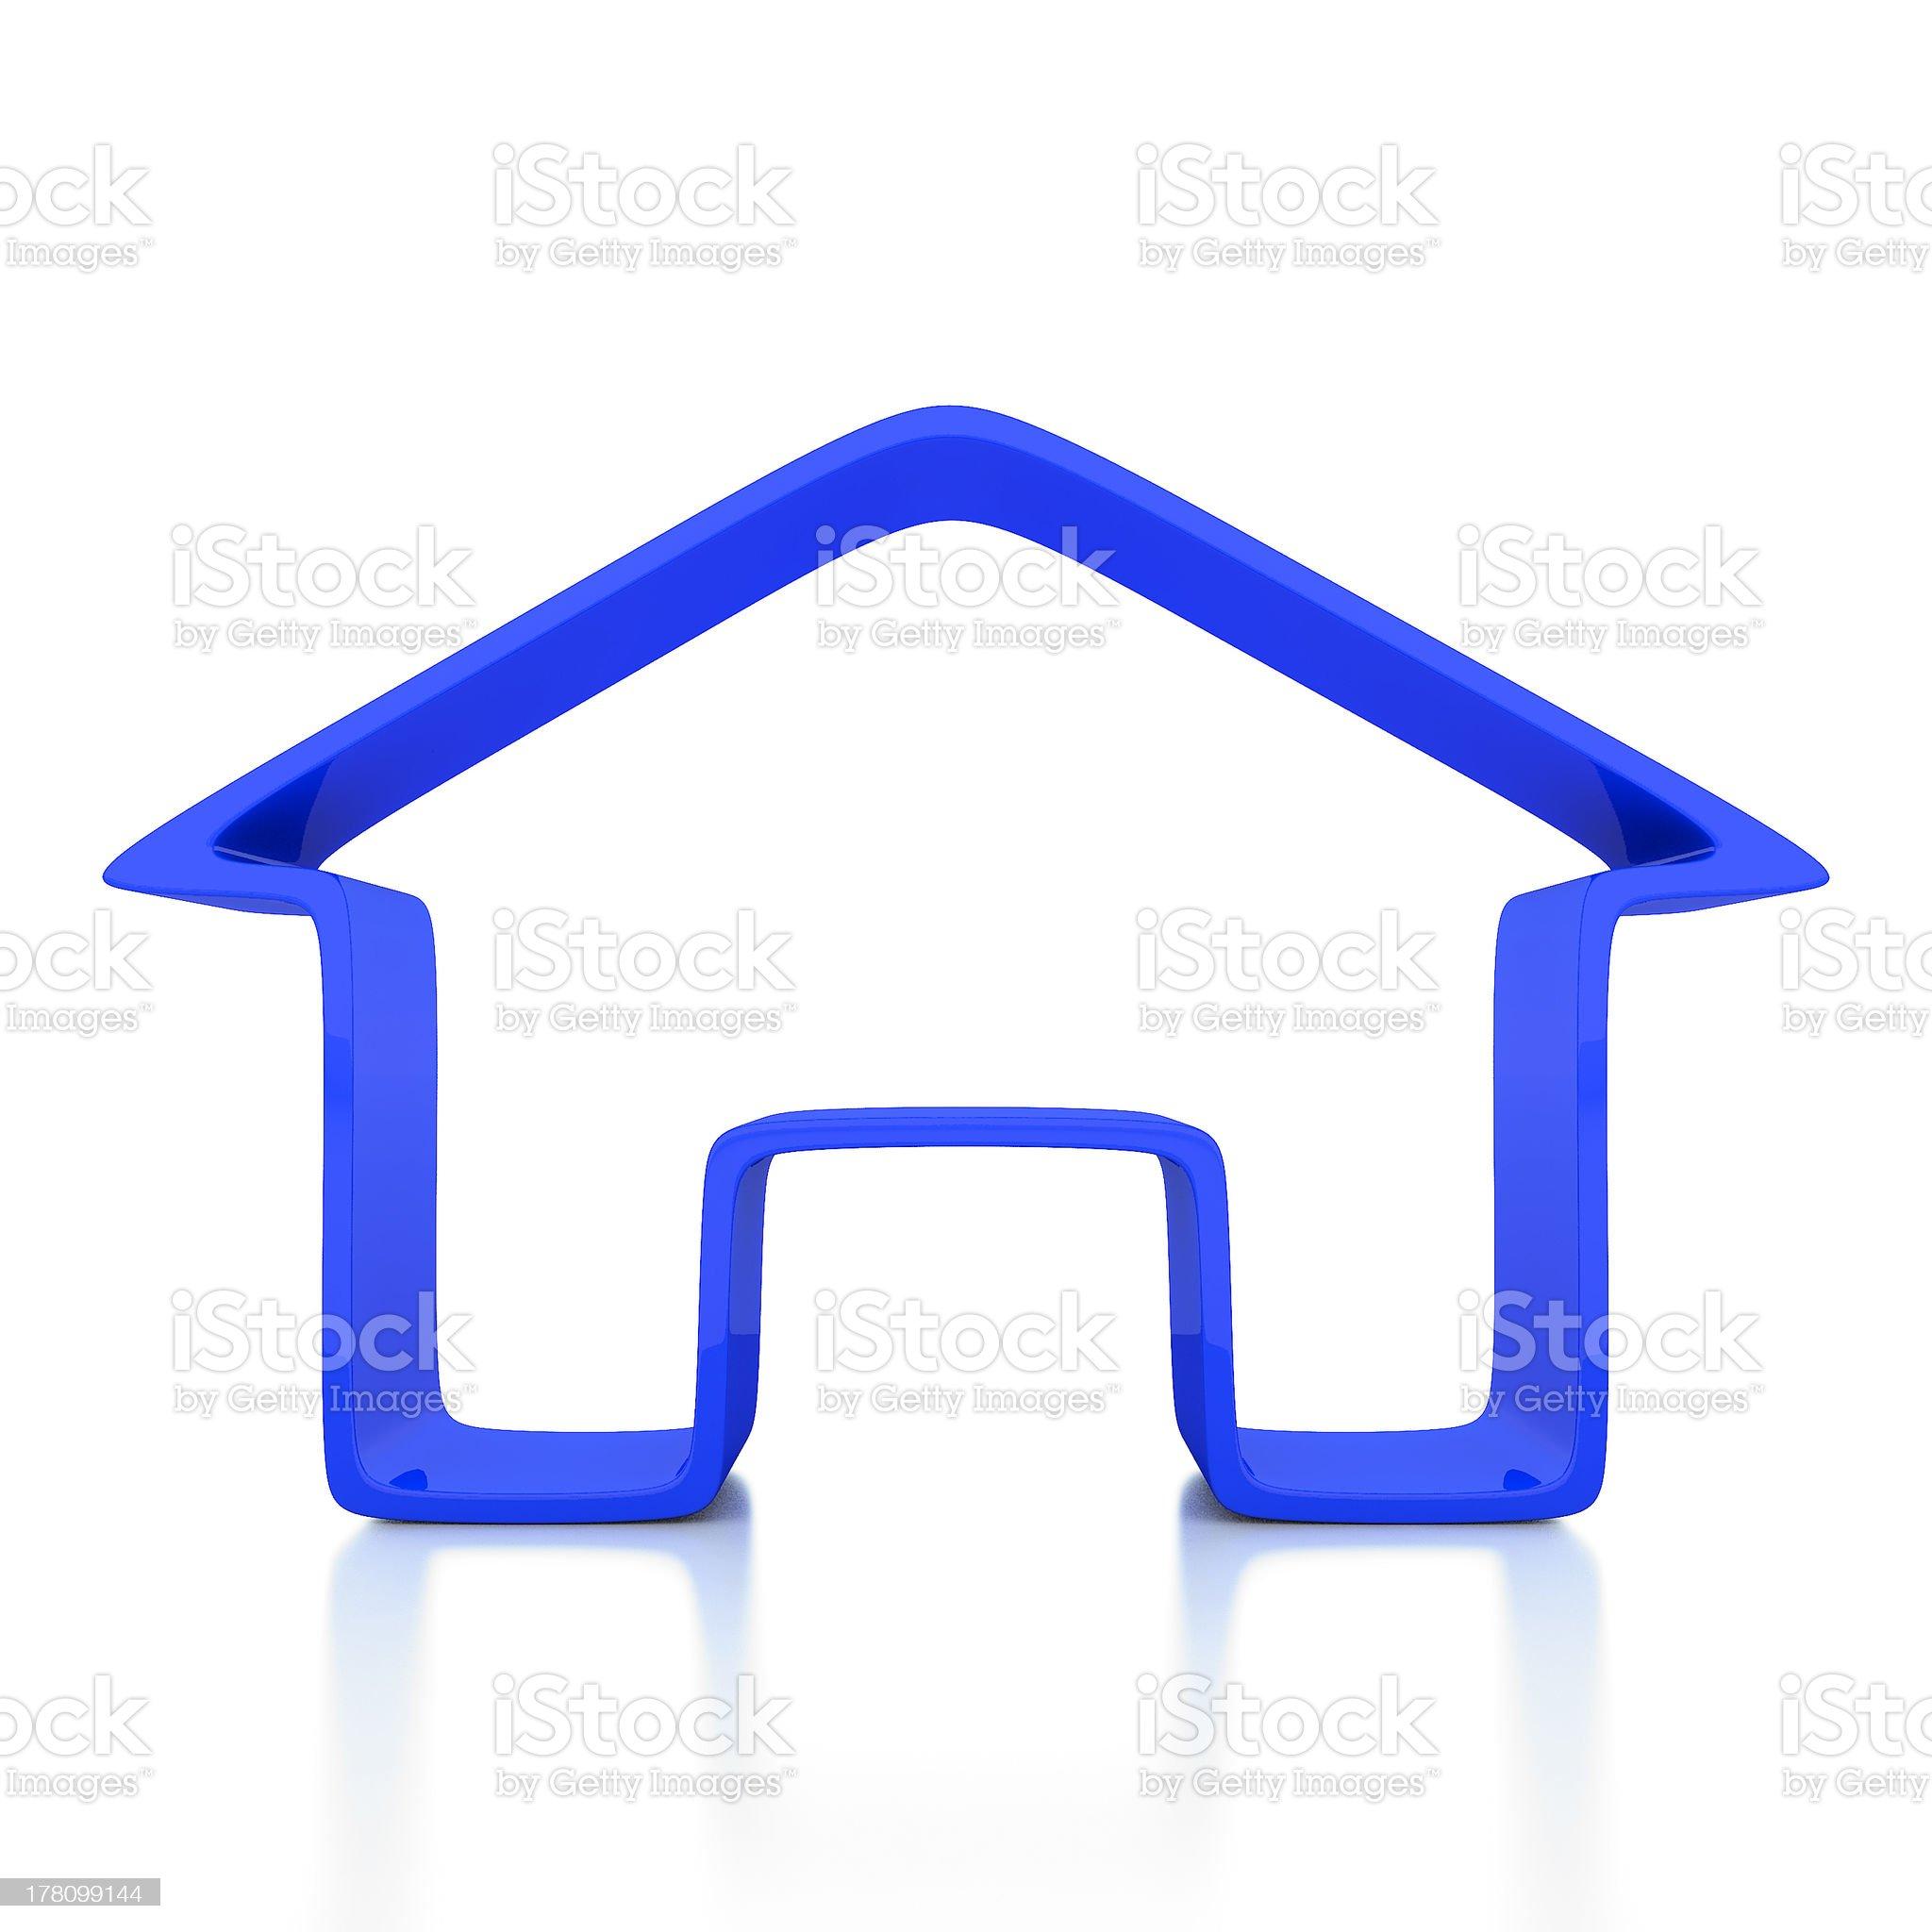 Home icon 3d illustrator royalty-free stock photo